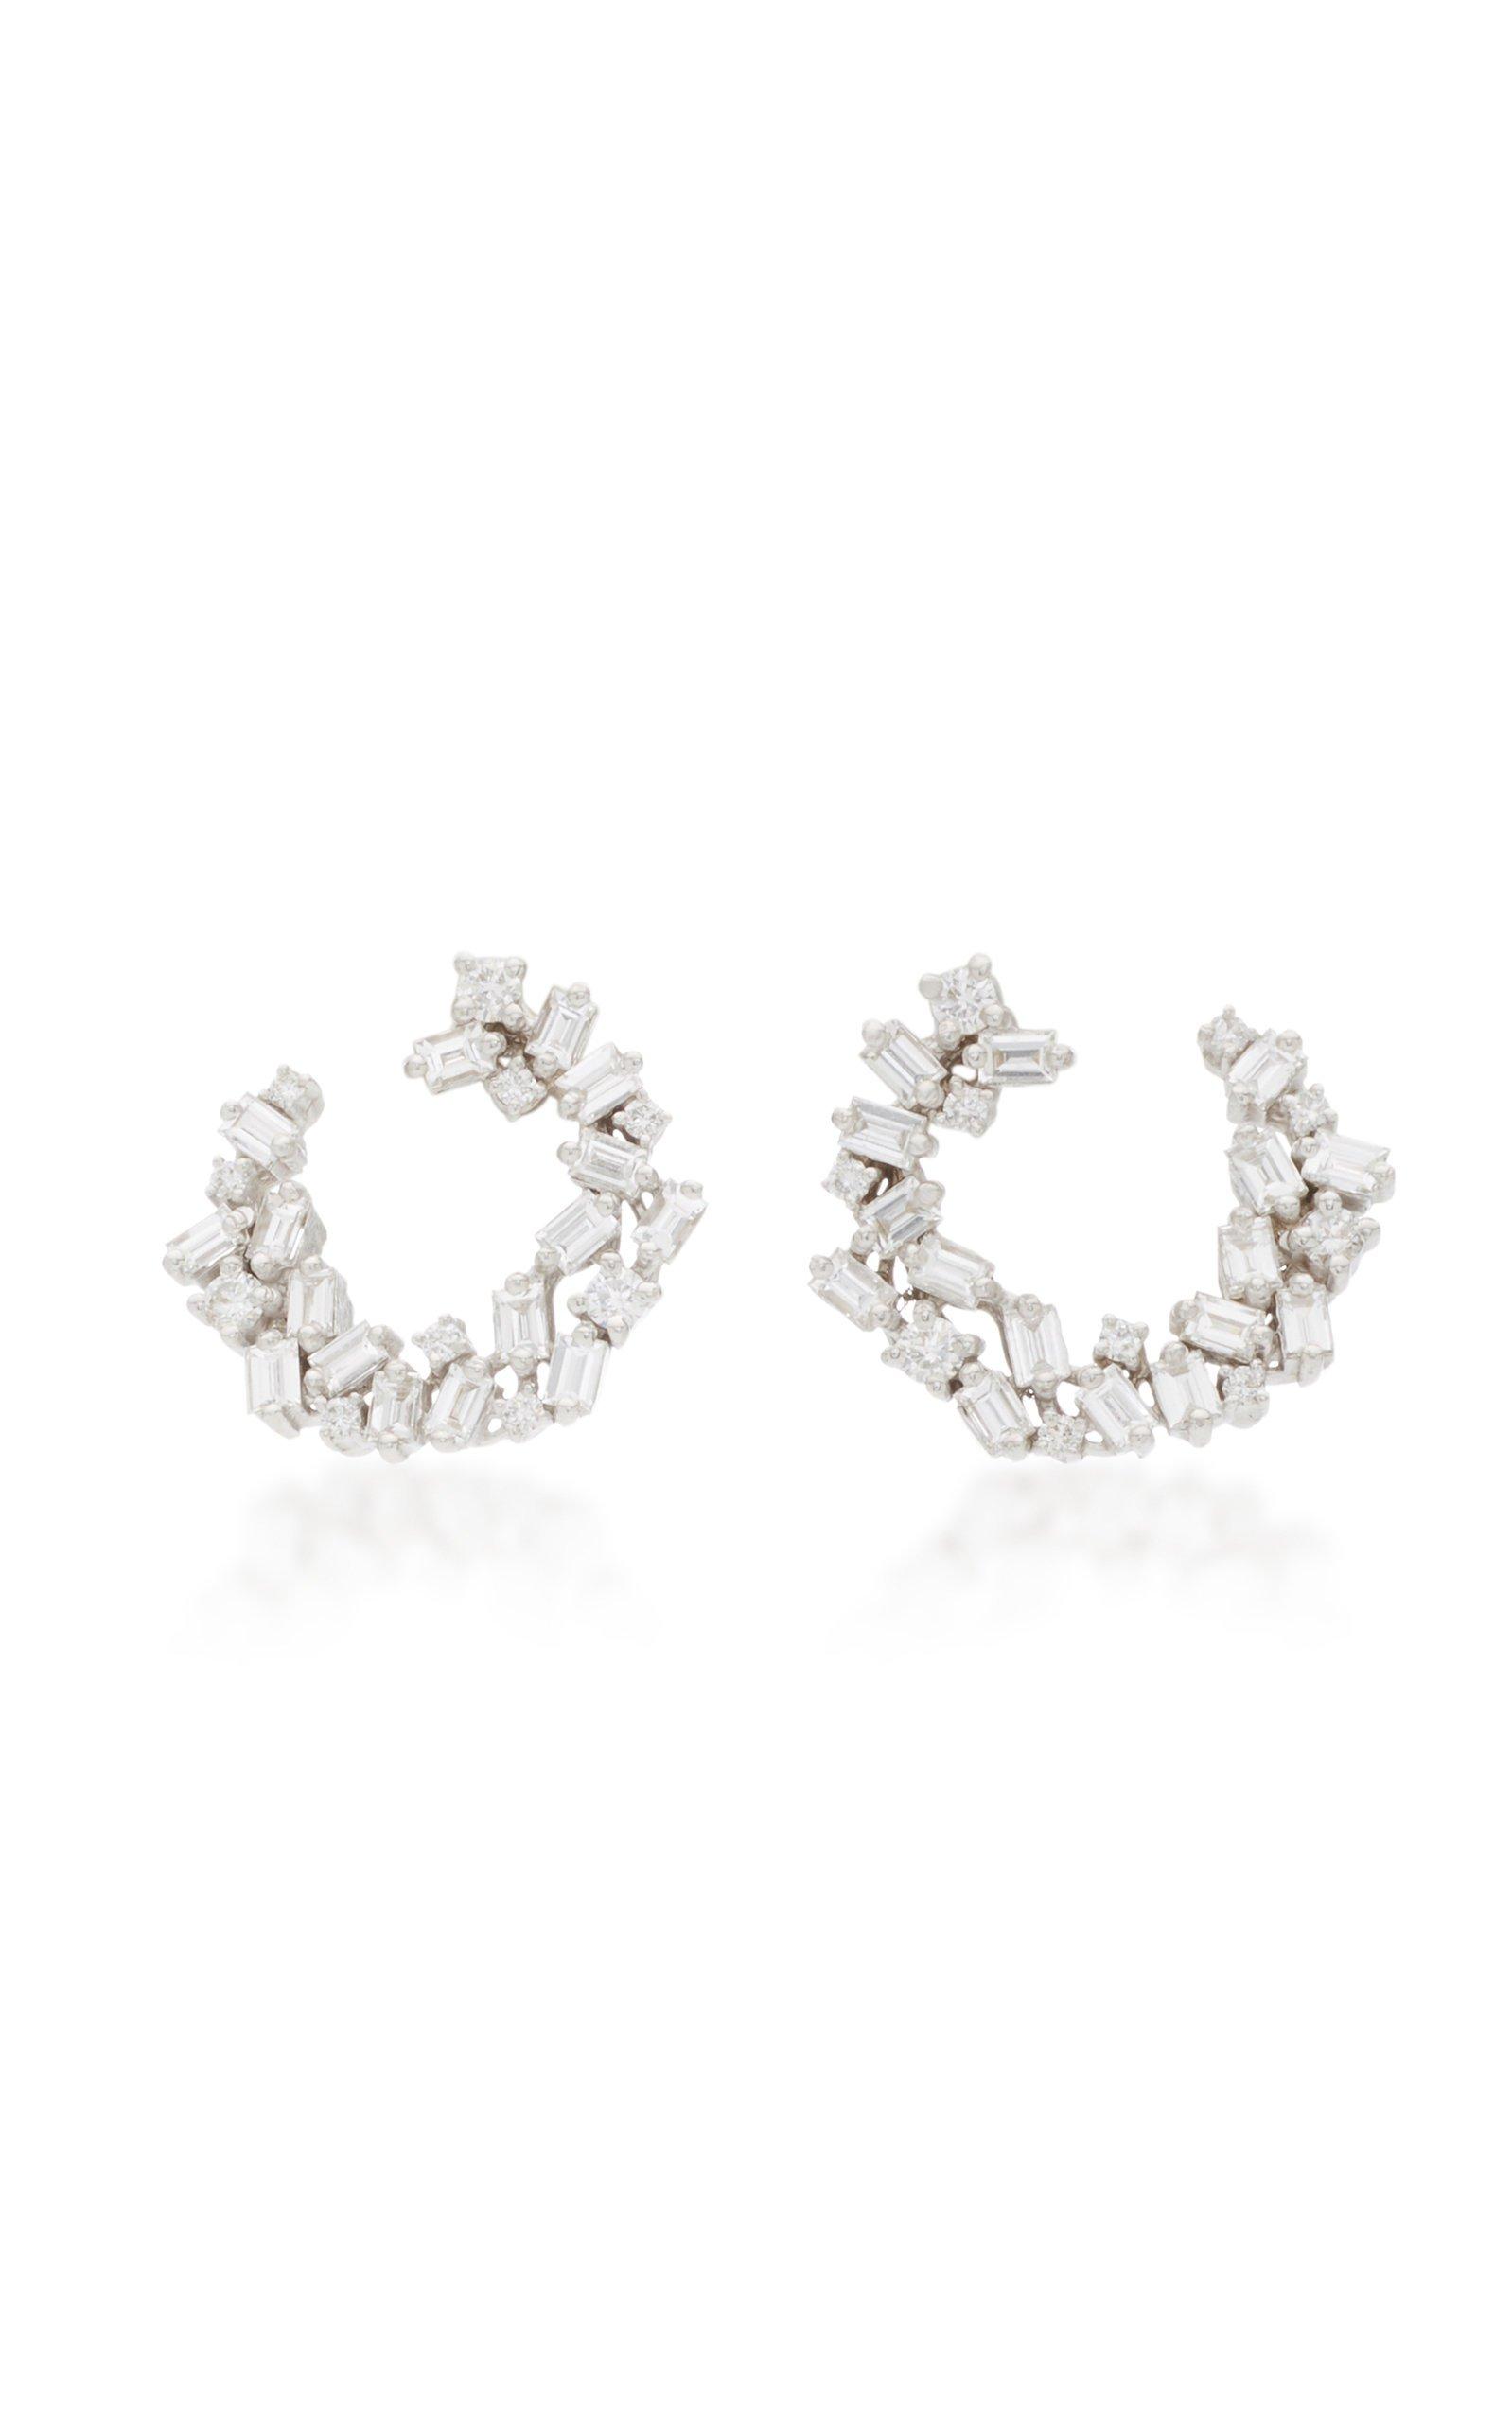 Suzanne Kalan 18K White Gold Mini Diamond Hoop Earrings